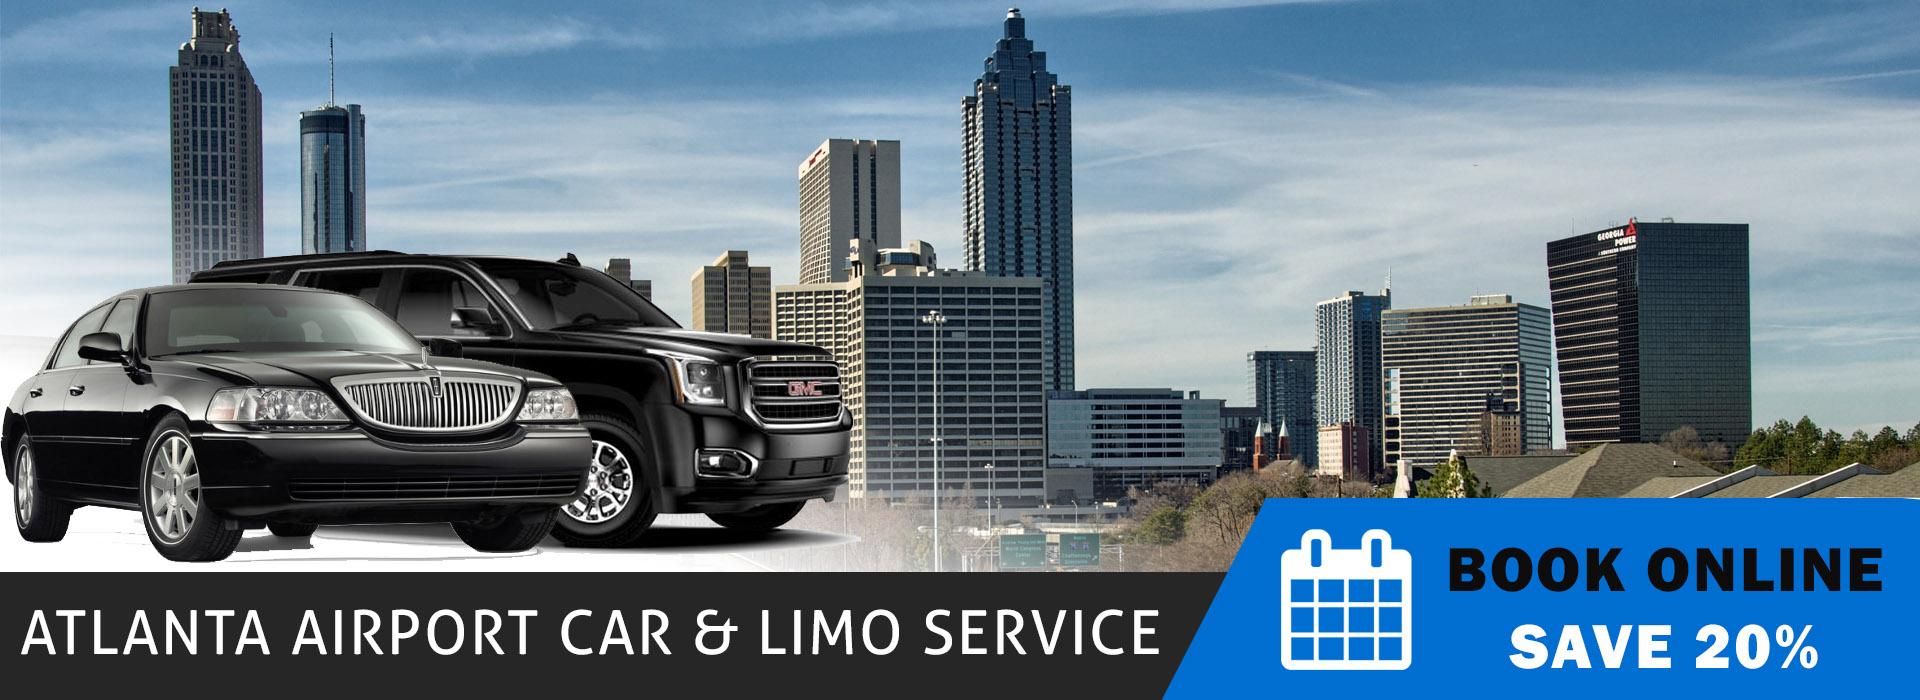 Apex Limousine Atlanta Airport Car Service Atlanta Limo Service